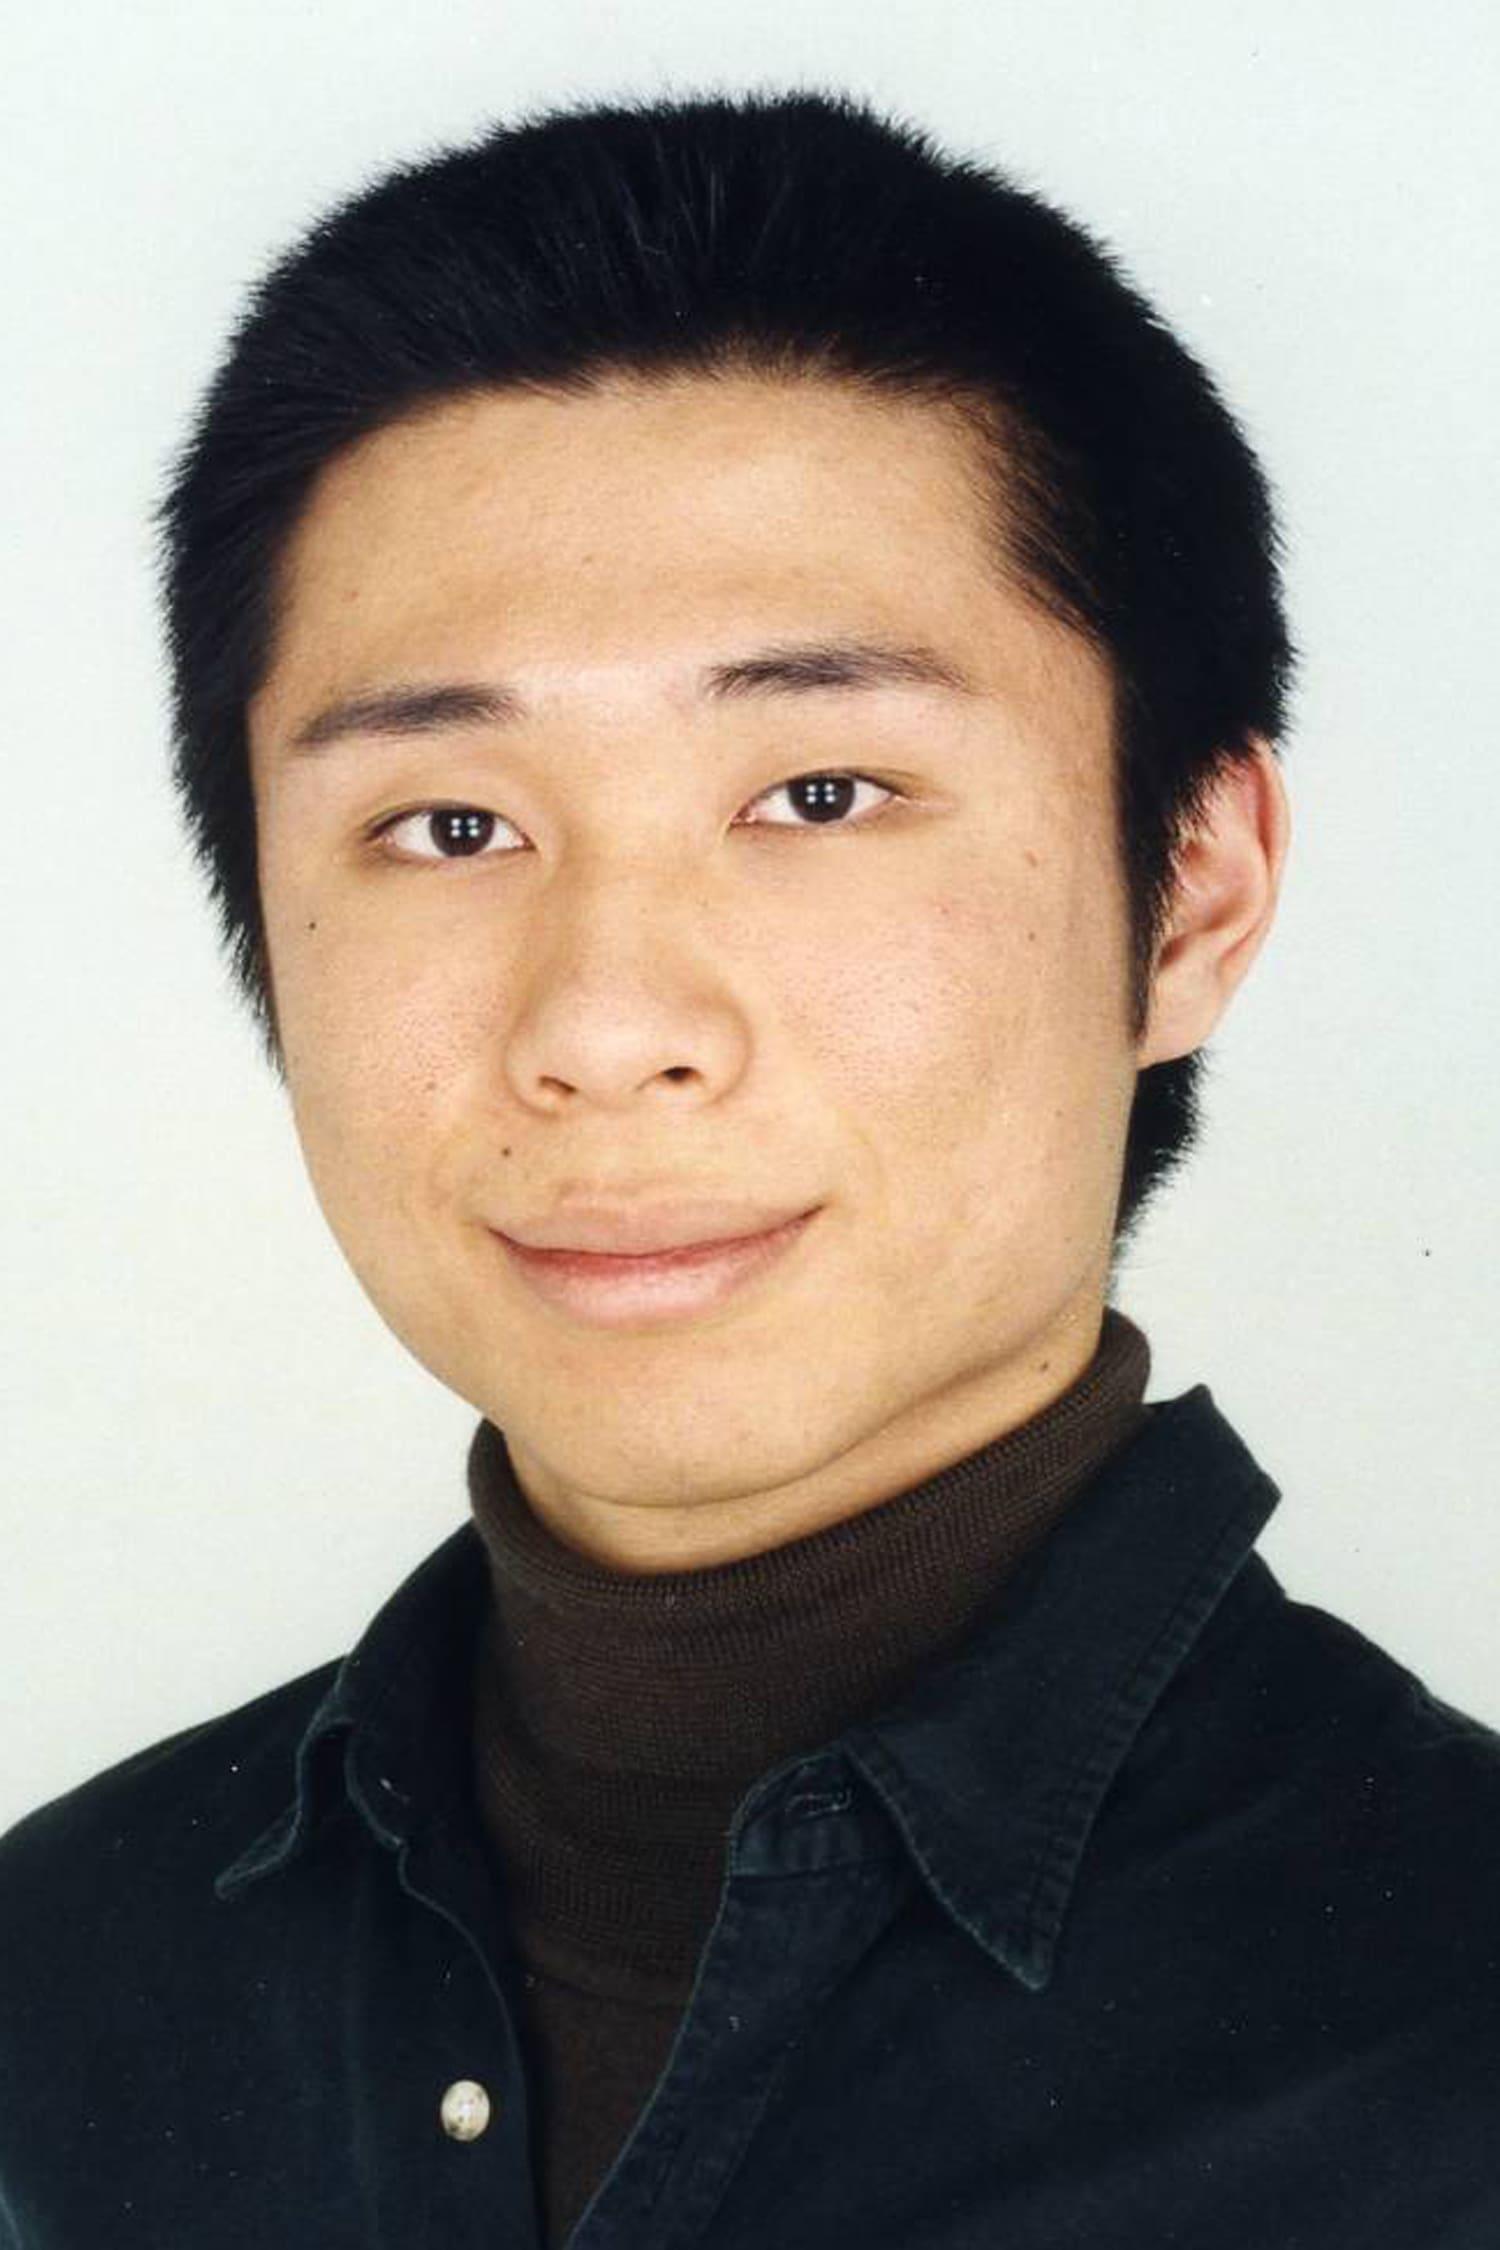 Yōhei Nishina